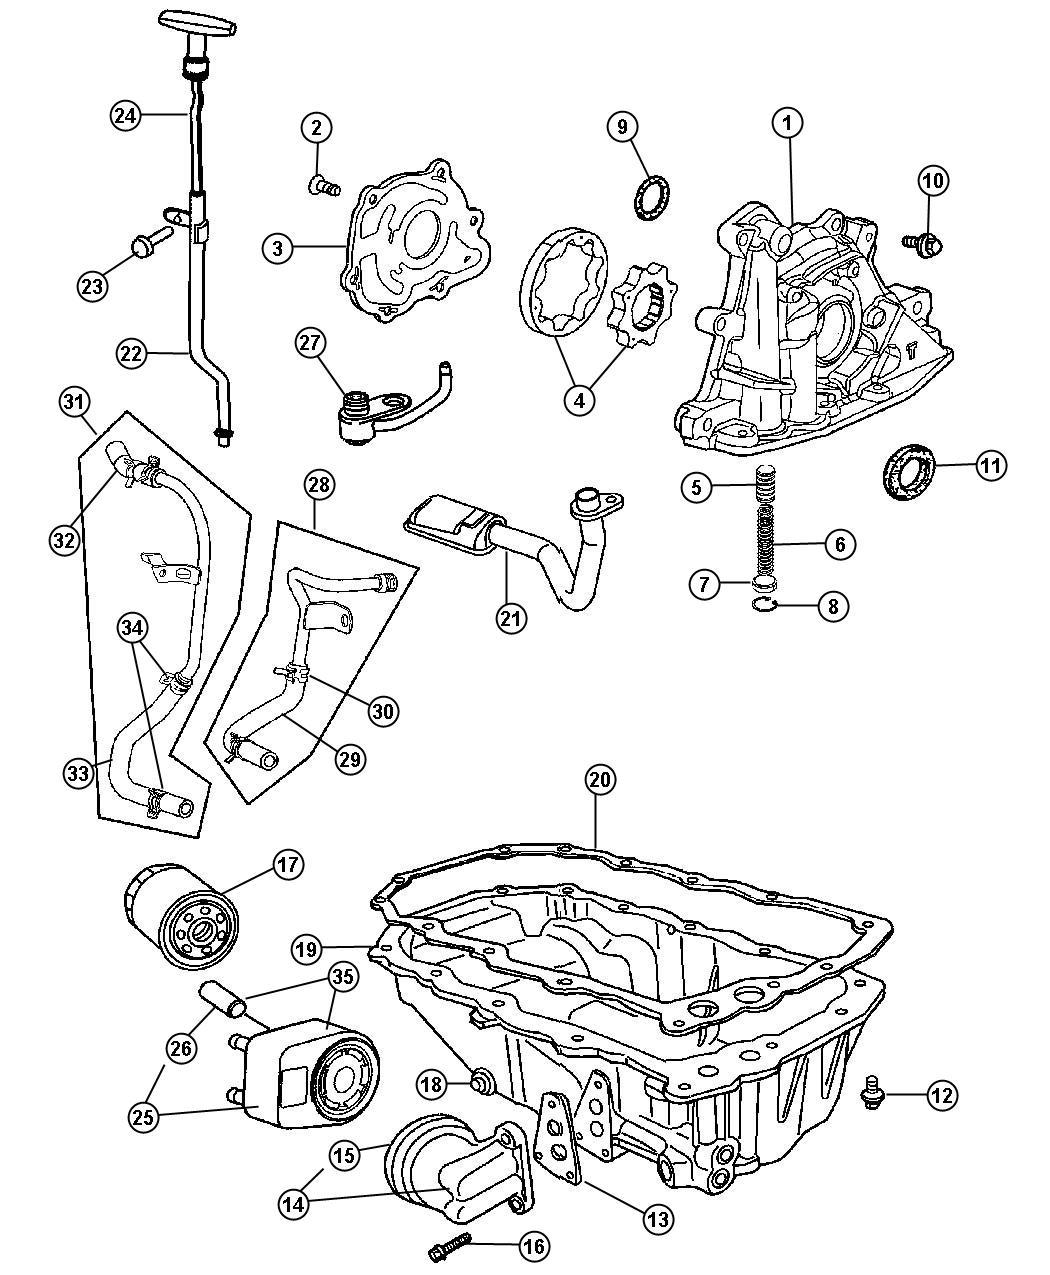 Chrysler Pt Cruiser Filter Engine Oil Suggested Drip